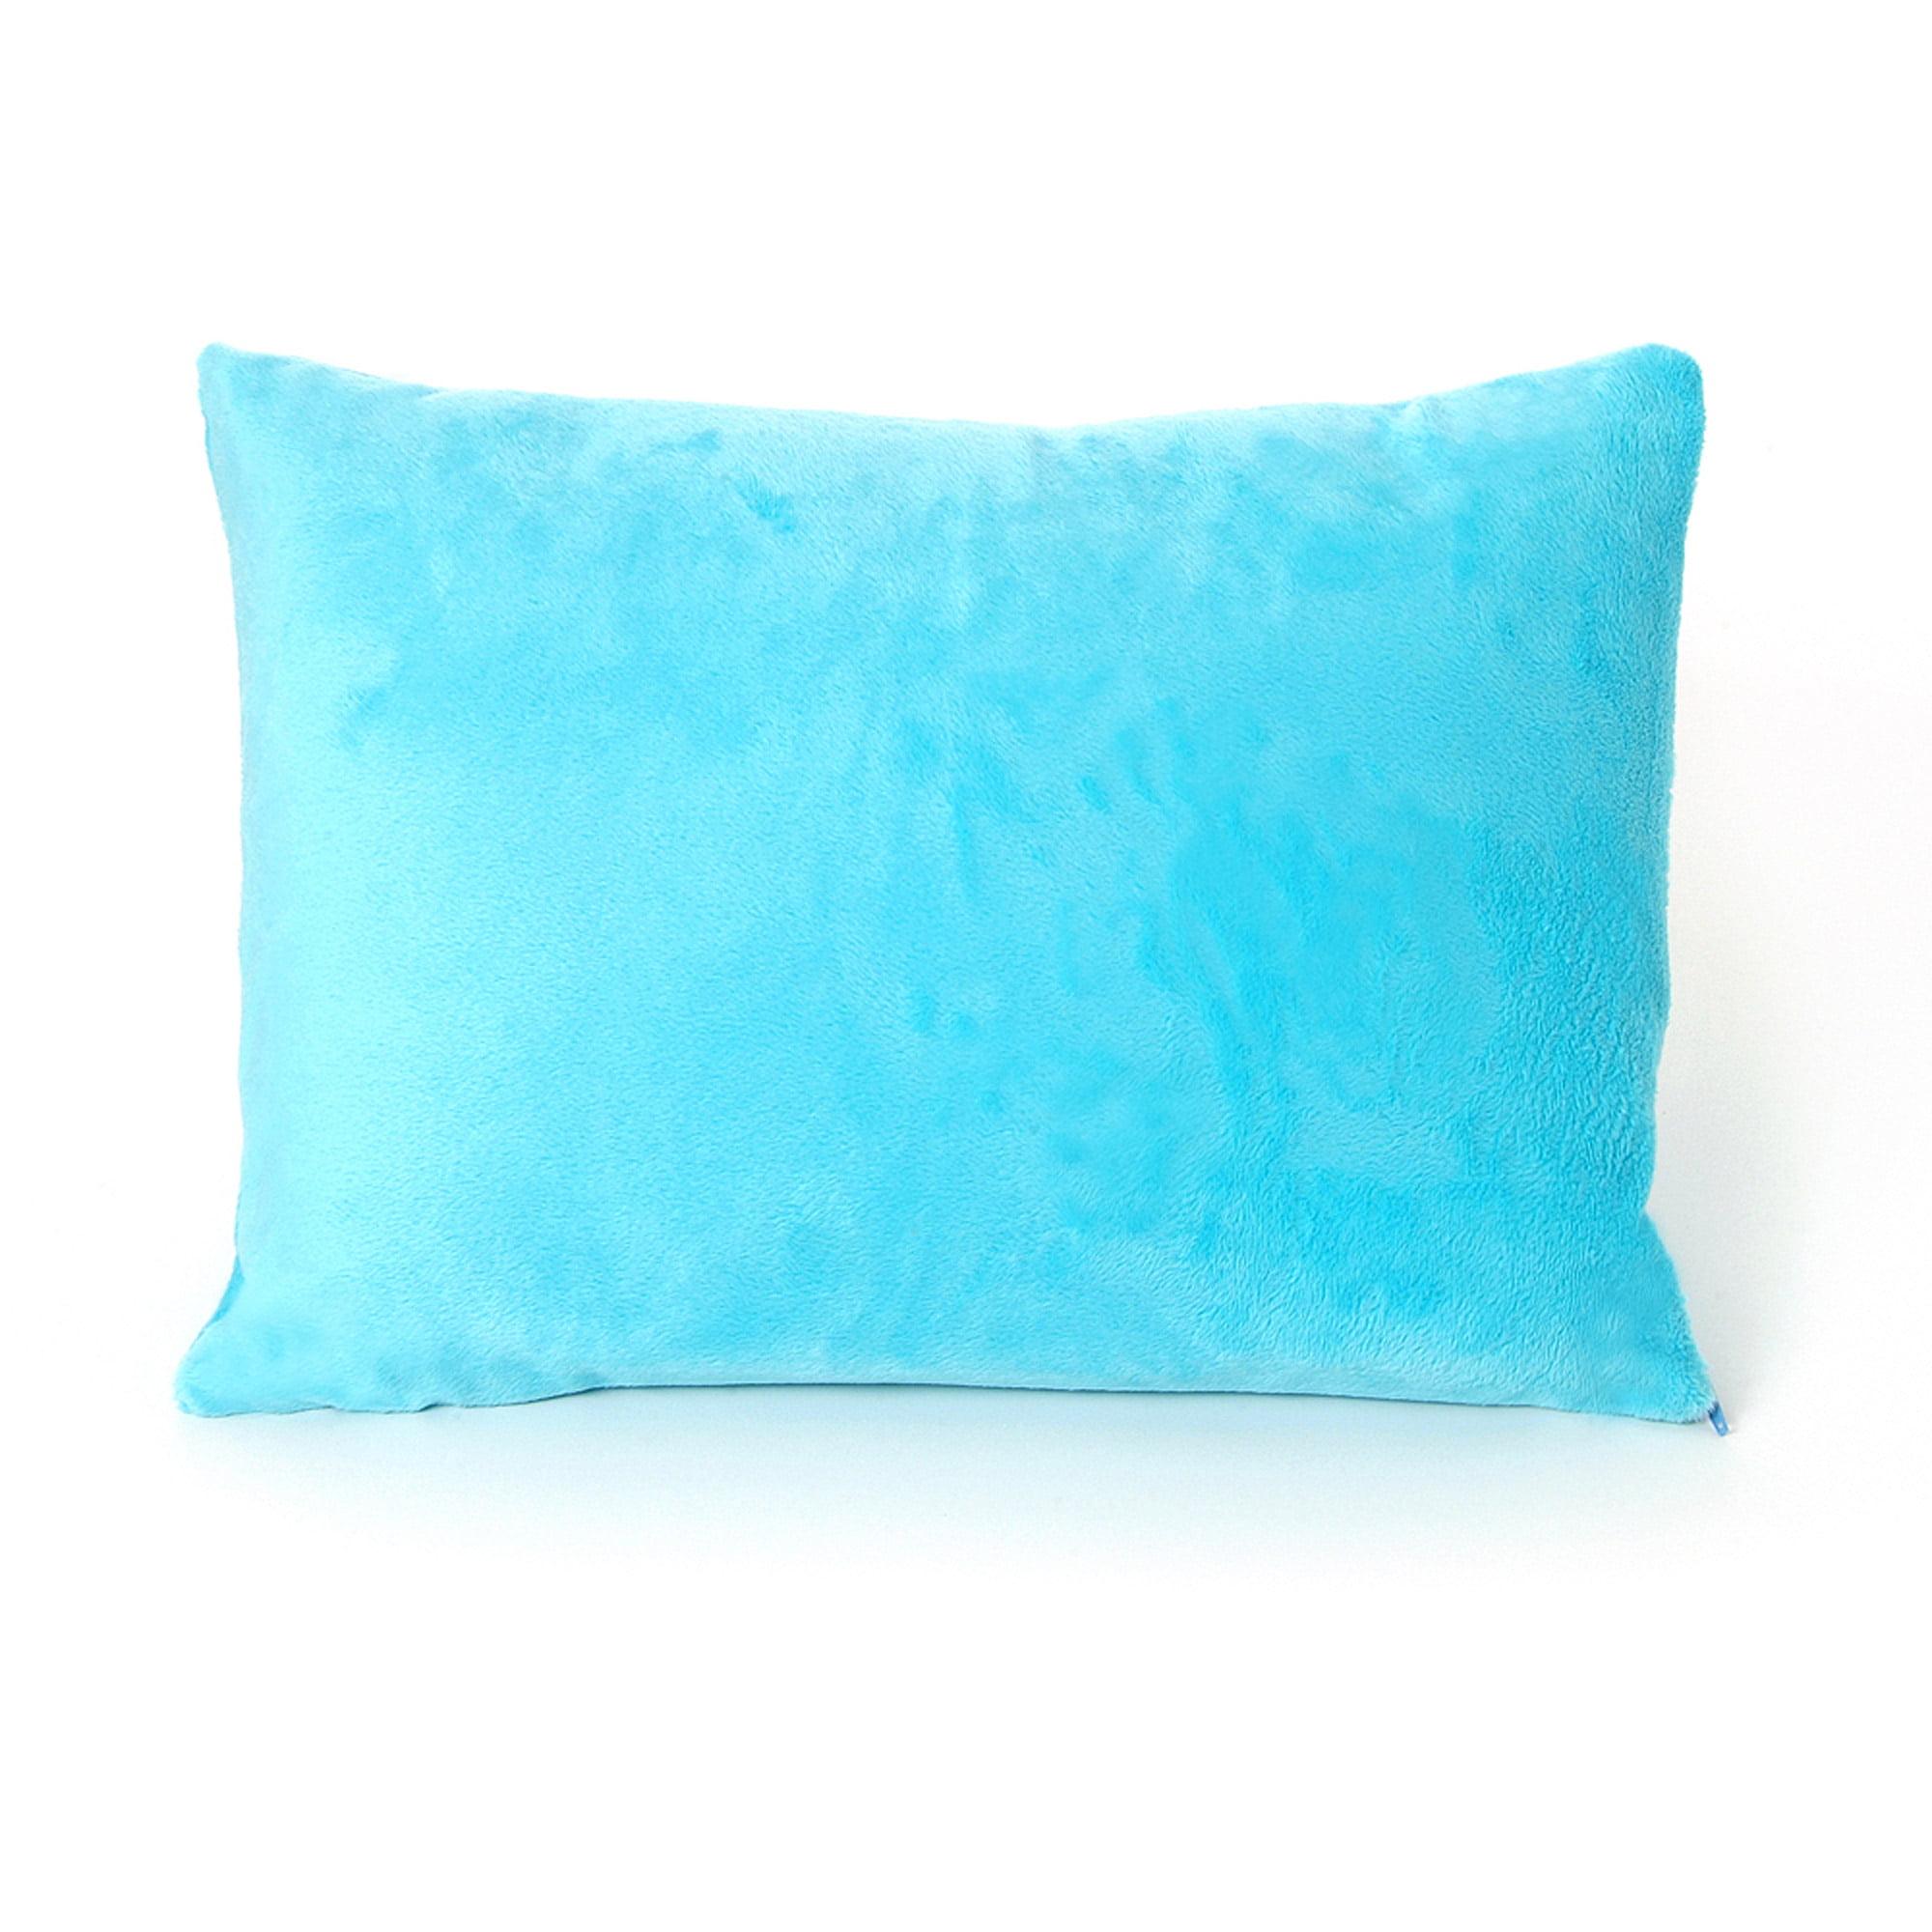 My First Kids Toddler Pillow Premium Memory Foam Toddler Pillow ...